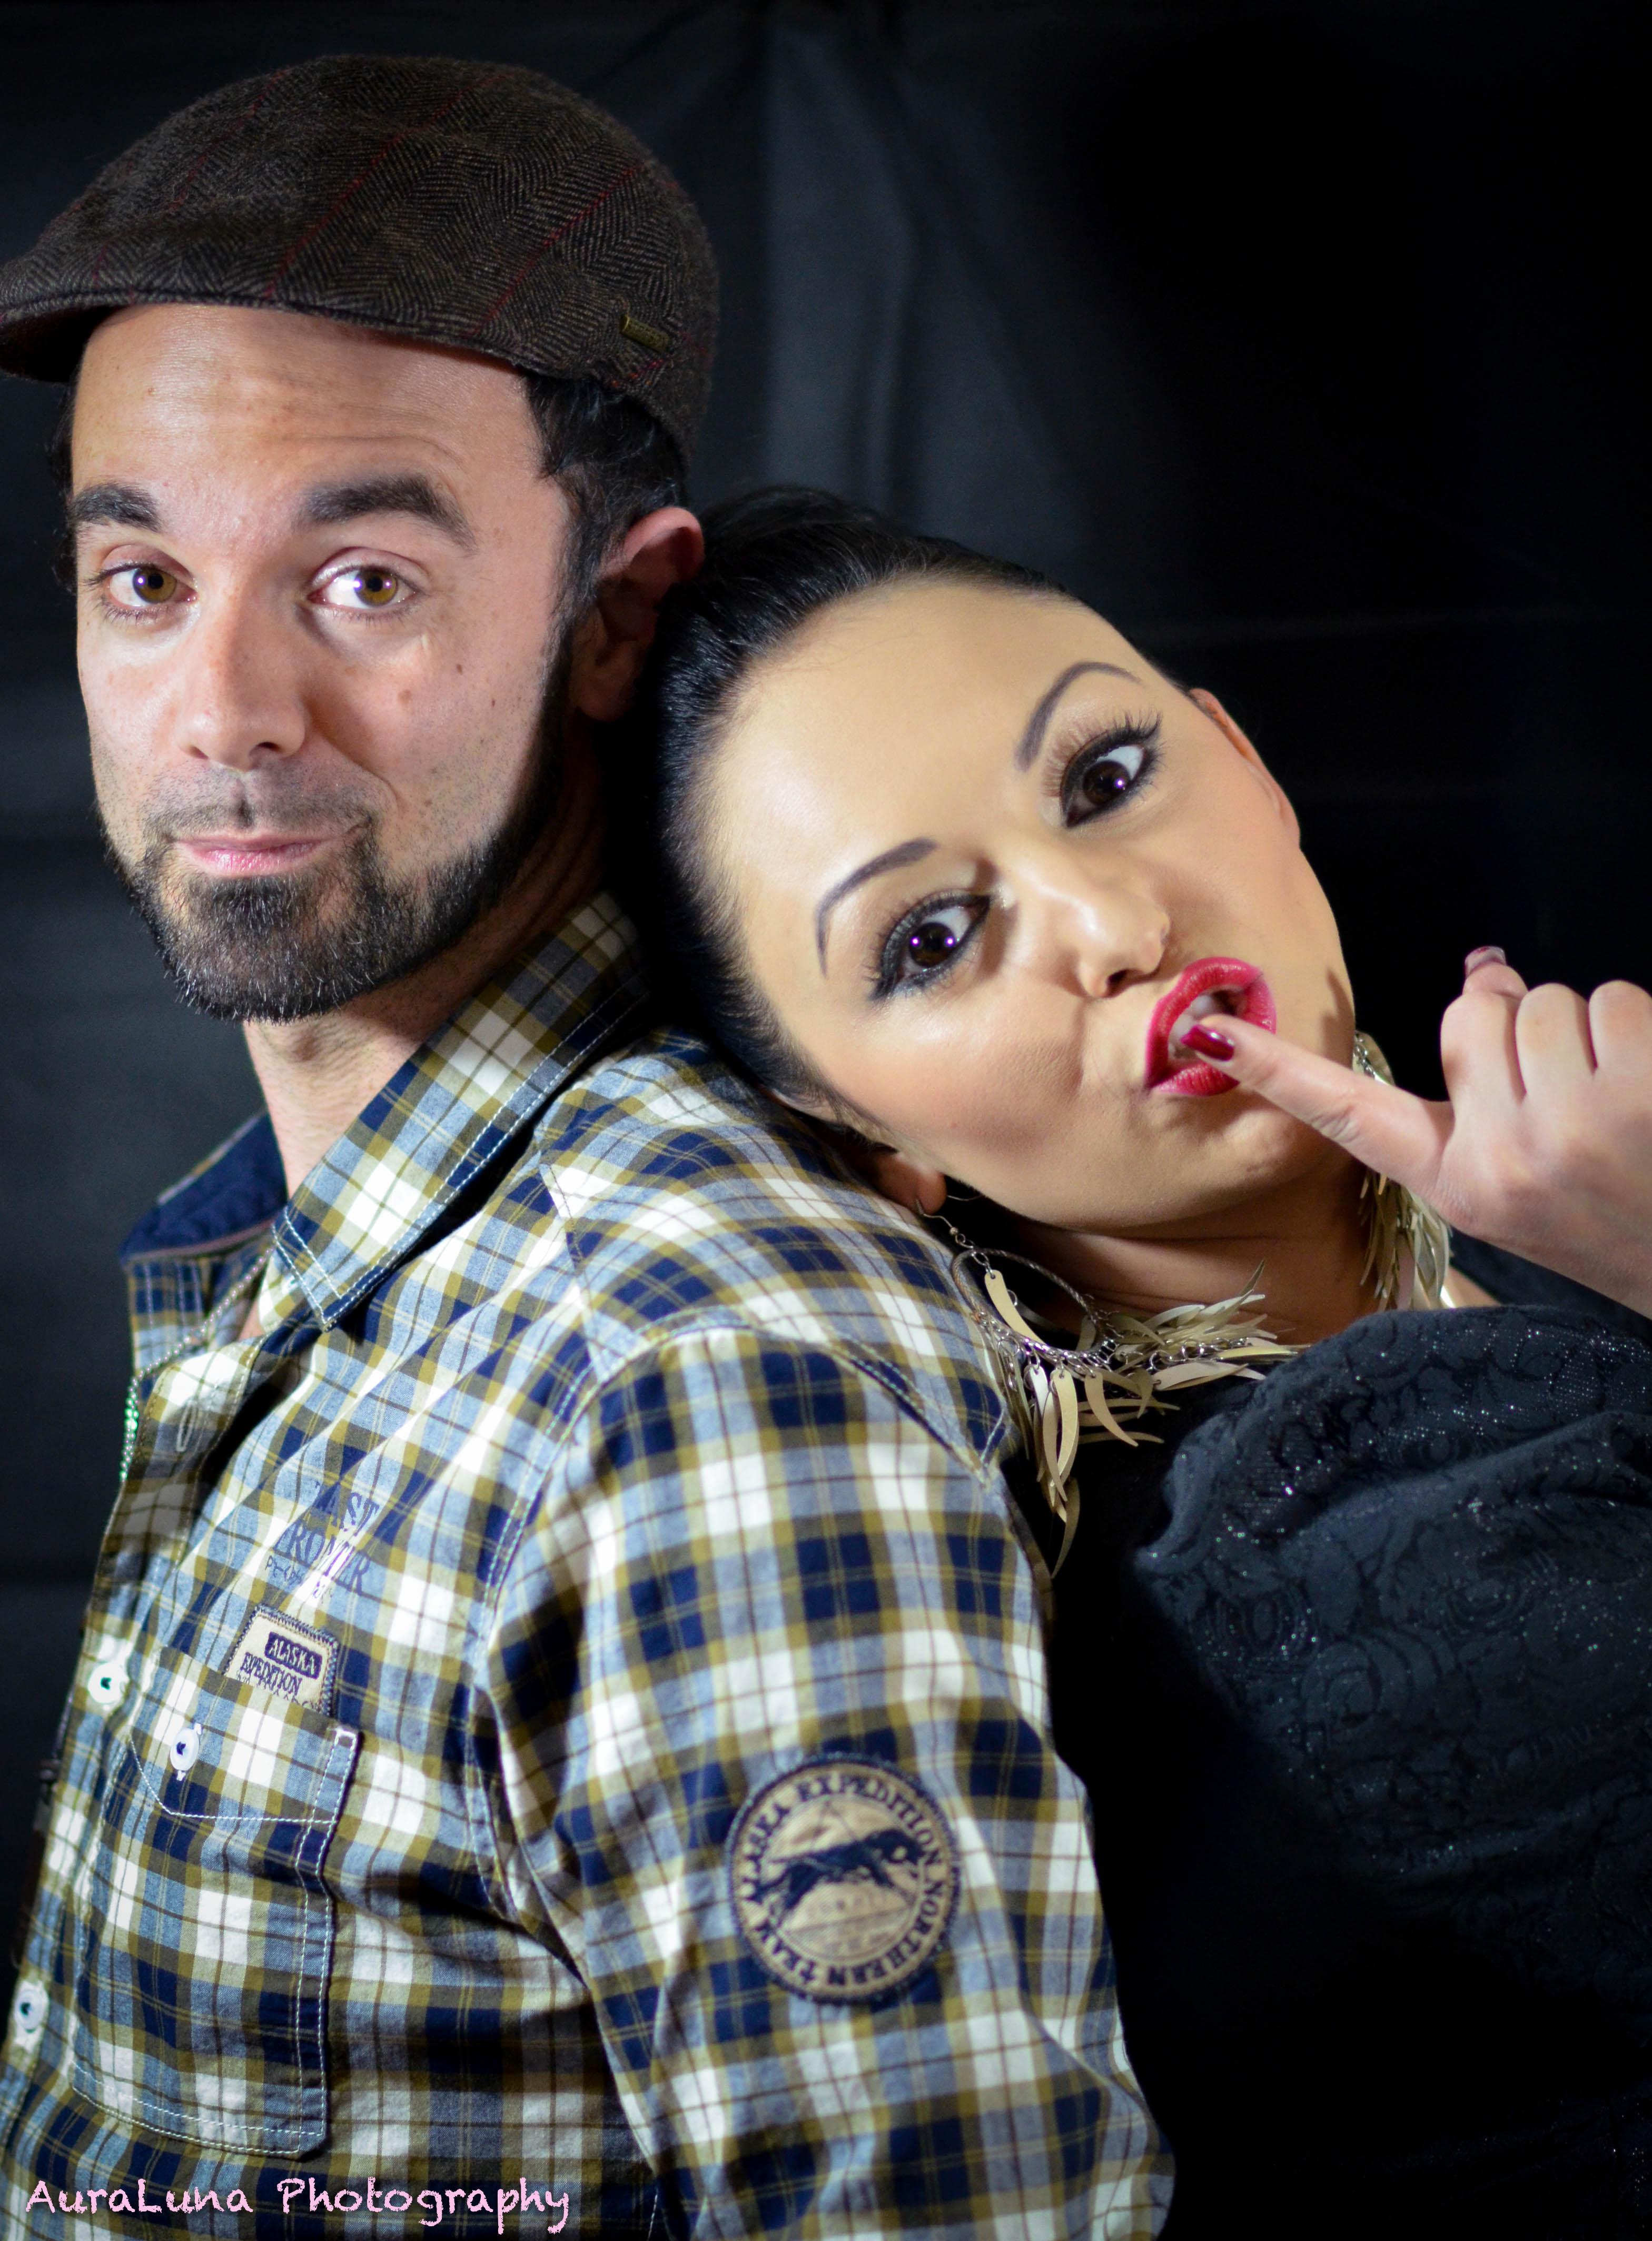 Dominik & Silvia...